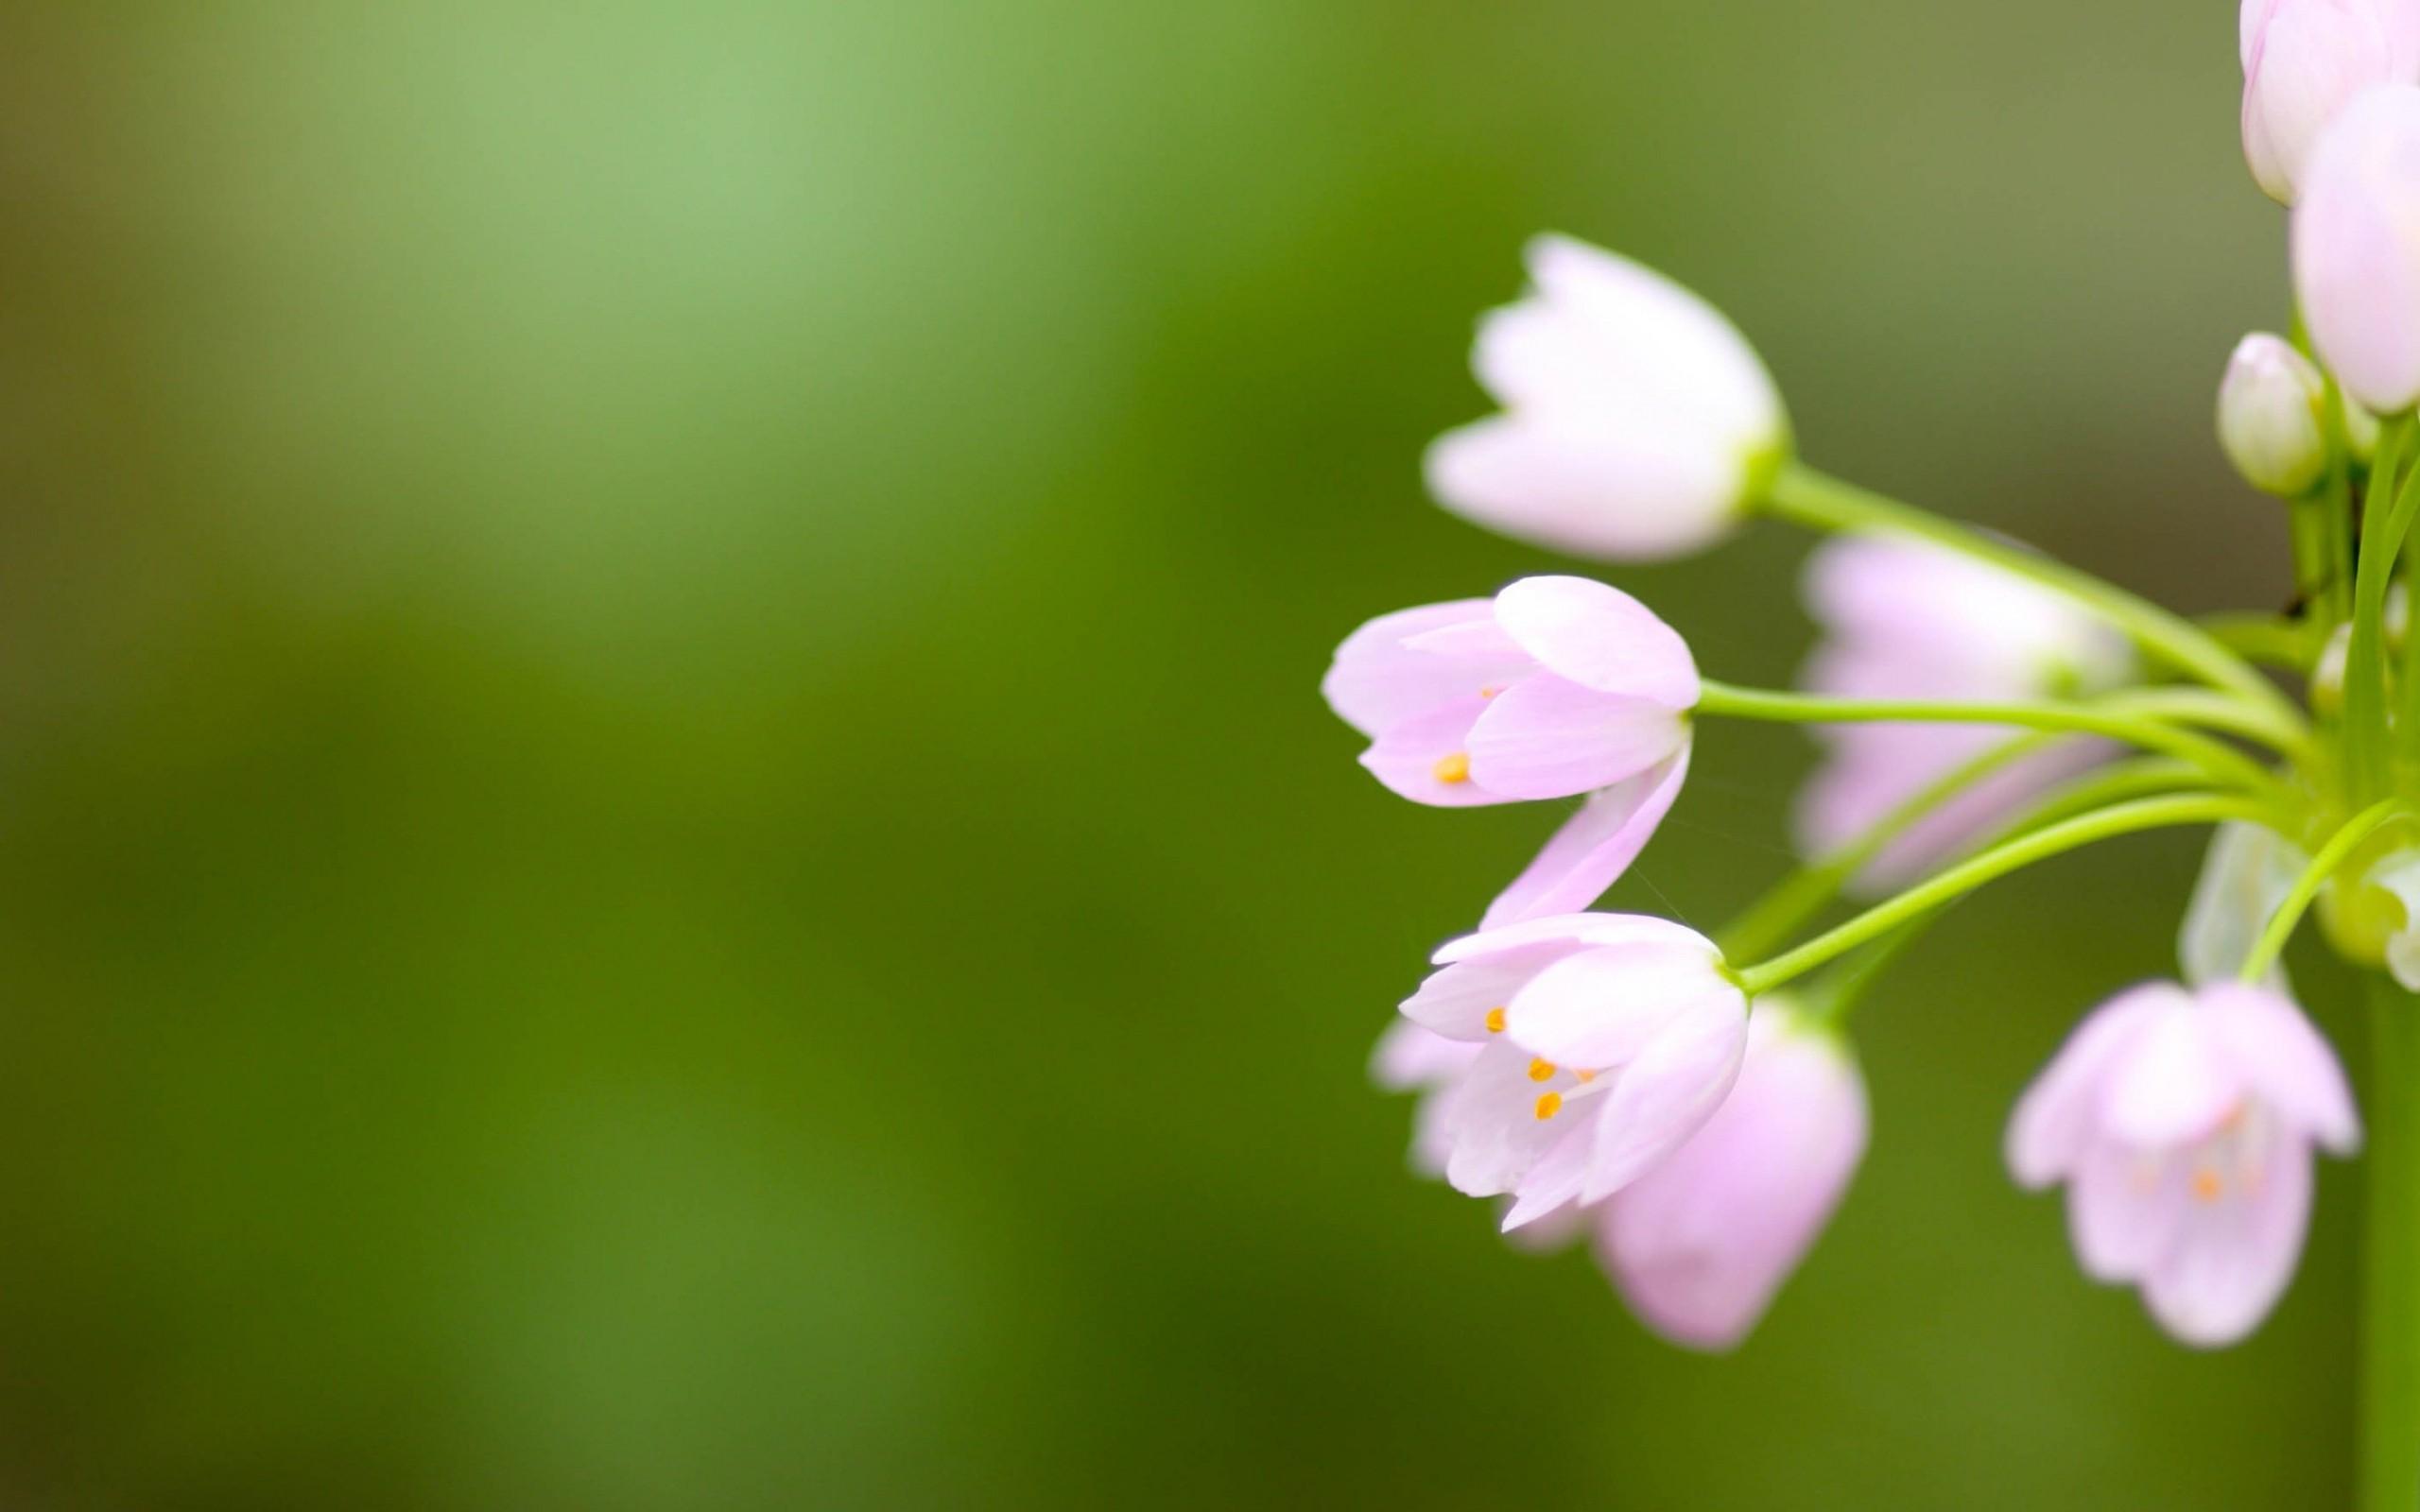 Flores tulipanes rosadas - 2560x1600